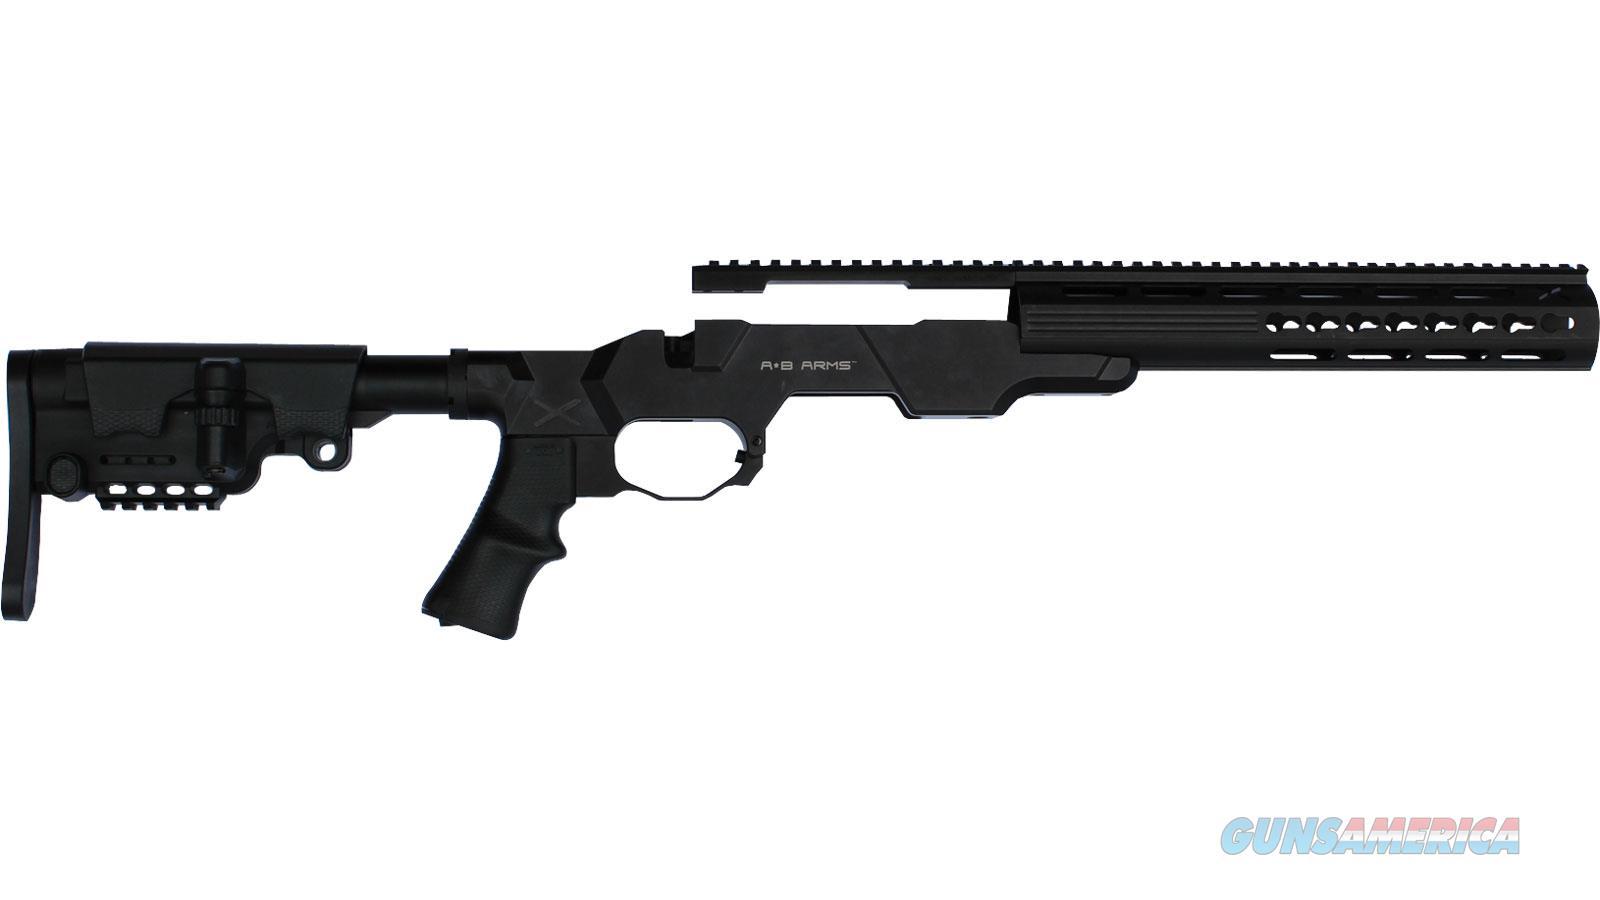 American Built Arms Company Modx Gen Iii Mod Rifle Sys ABAMXH1500B  Non-Guns > Gunstocks, Grips & Wood